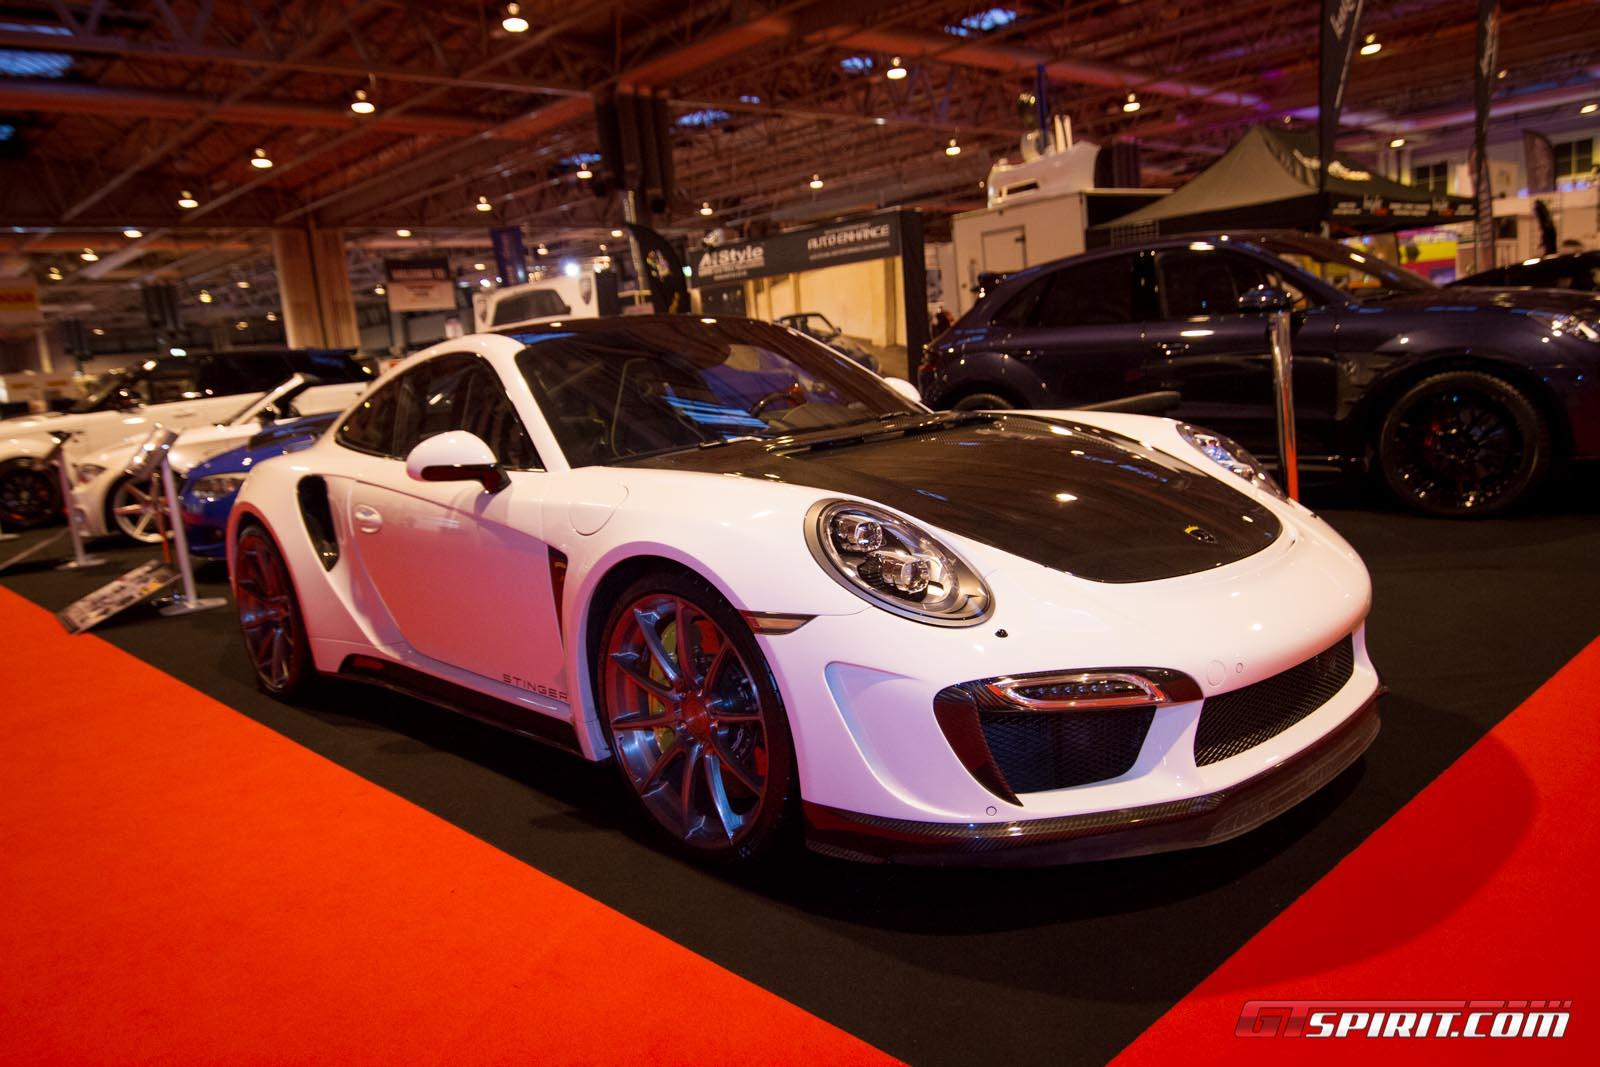 Search Used Cars listings to find Grand Rapids, Grand Rapids, MI, Kalamazoo, MI deals from Auto Sport INC.